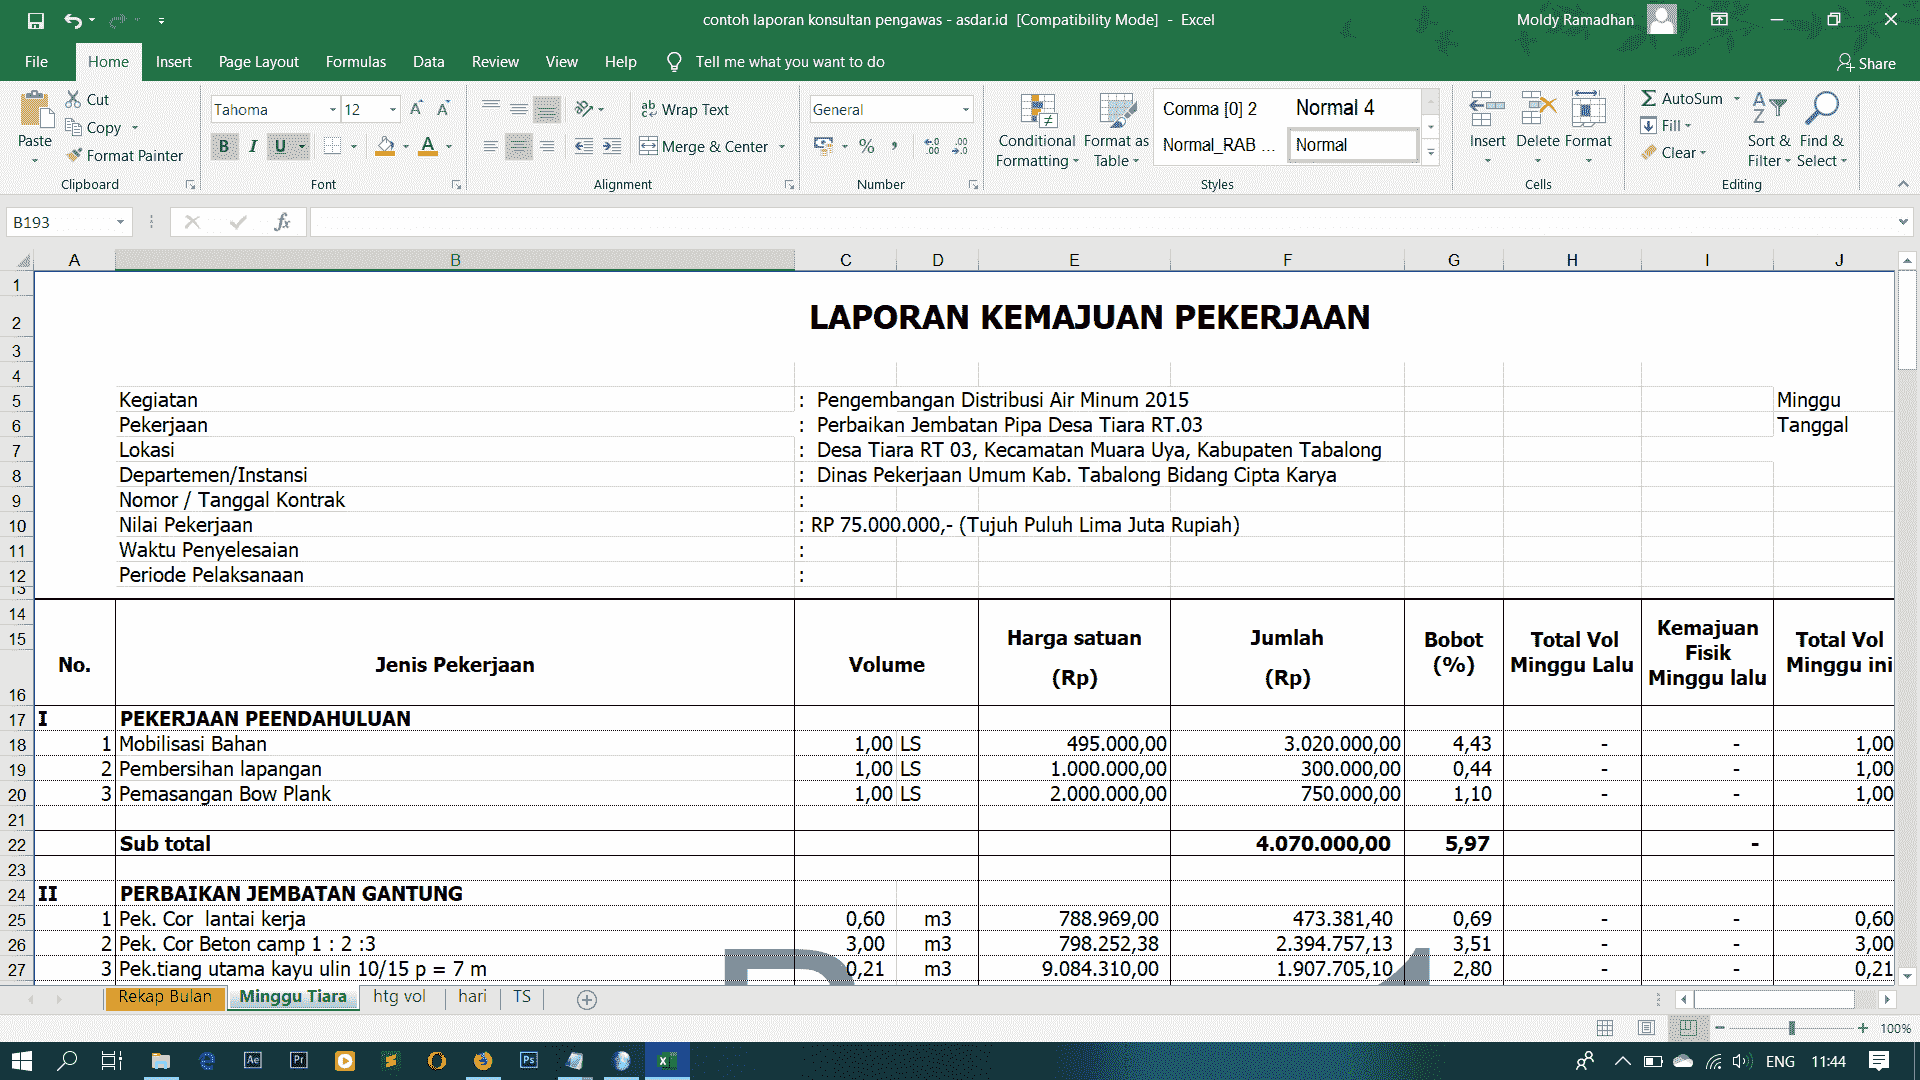 Contoh Laporan Konsultan Pengawas Laporan Bulanan Mingguan Harian Dan Jadwal Pelaksanaan Format Excel Asdar Id